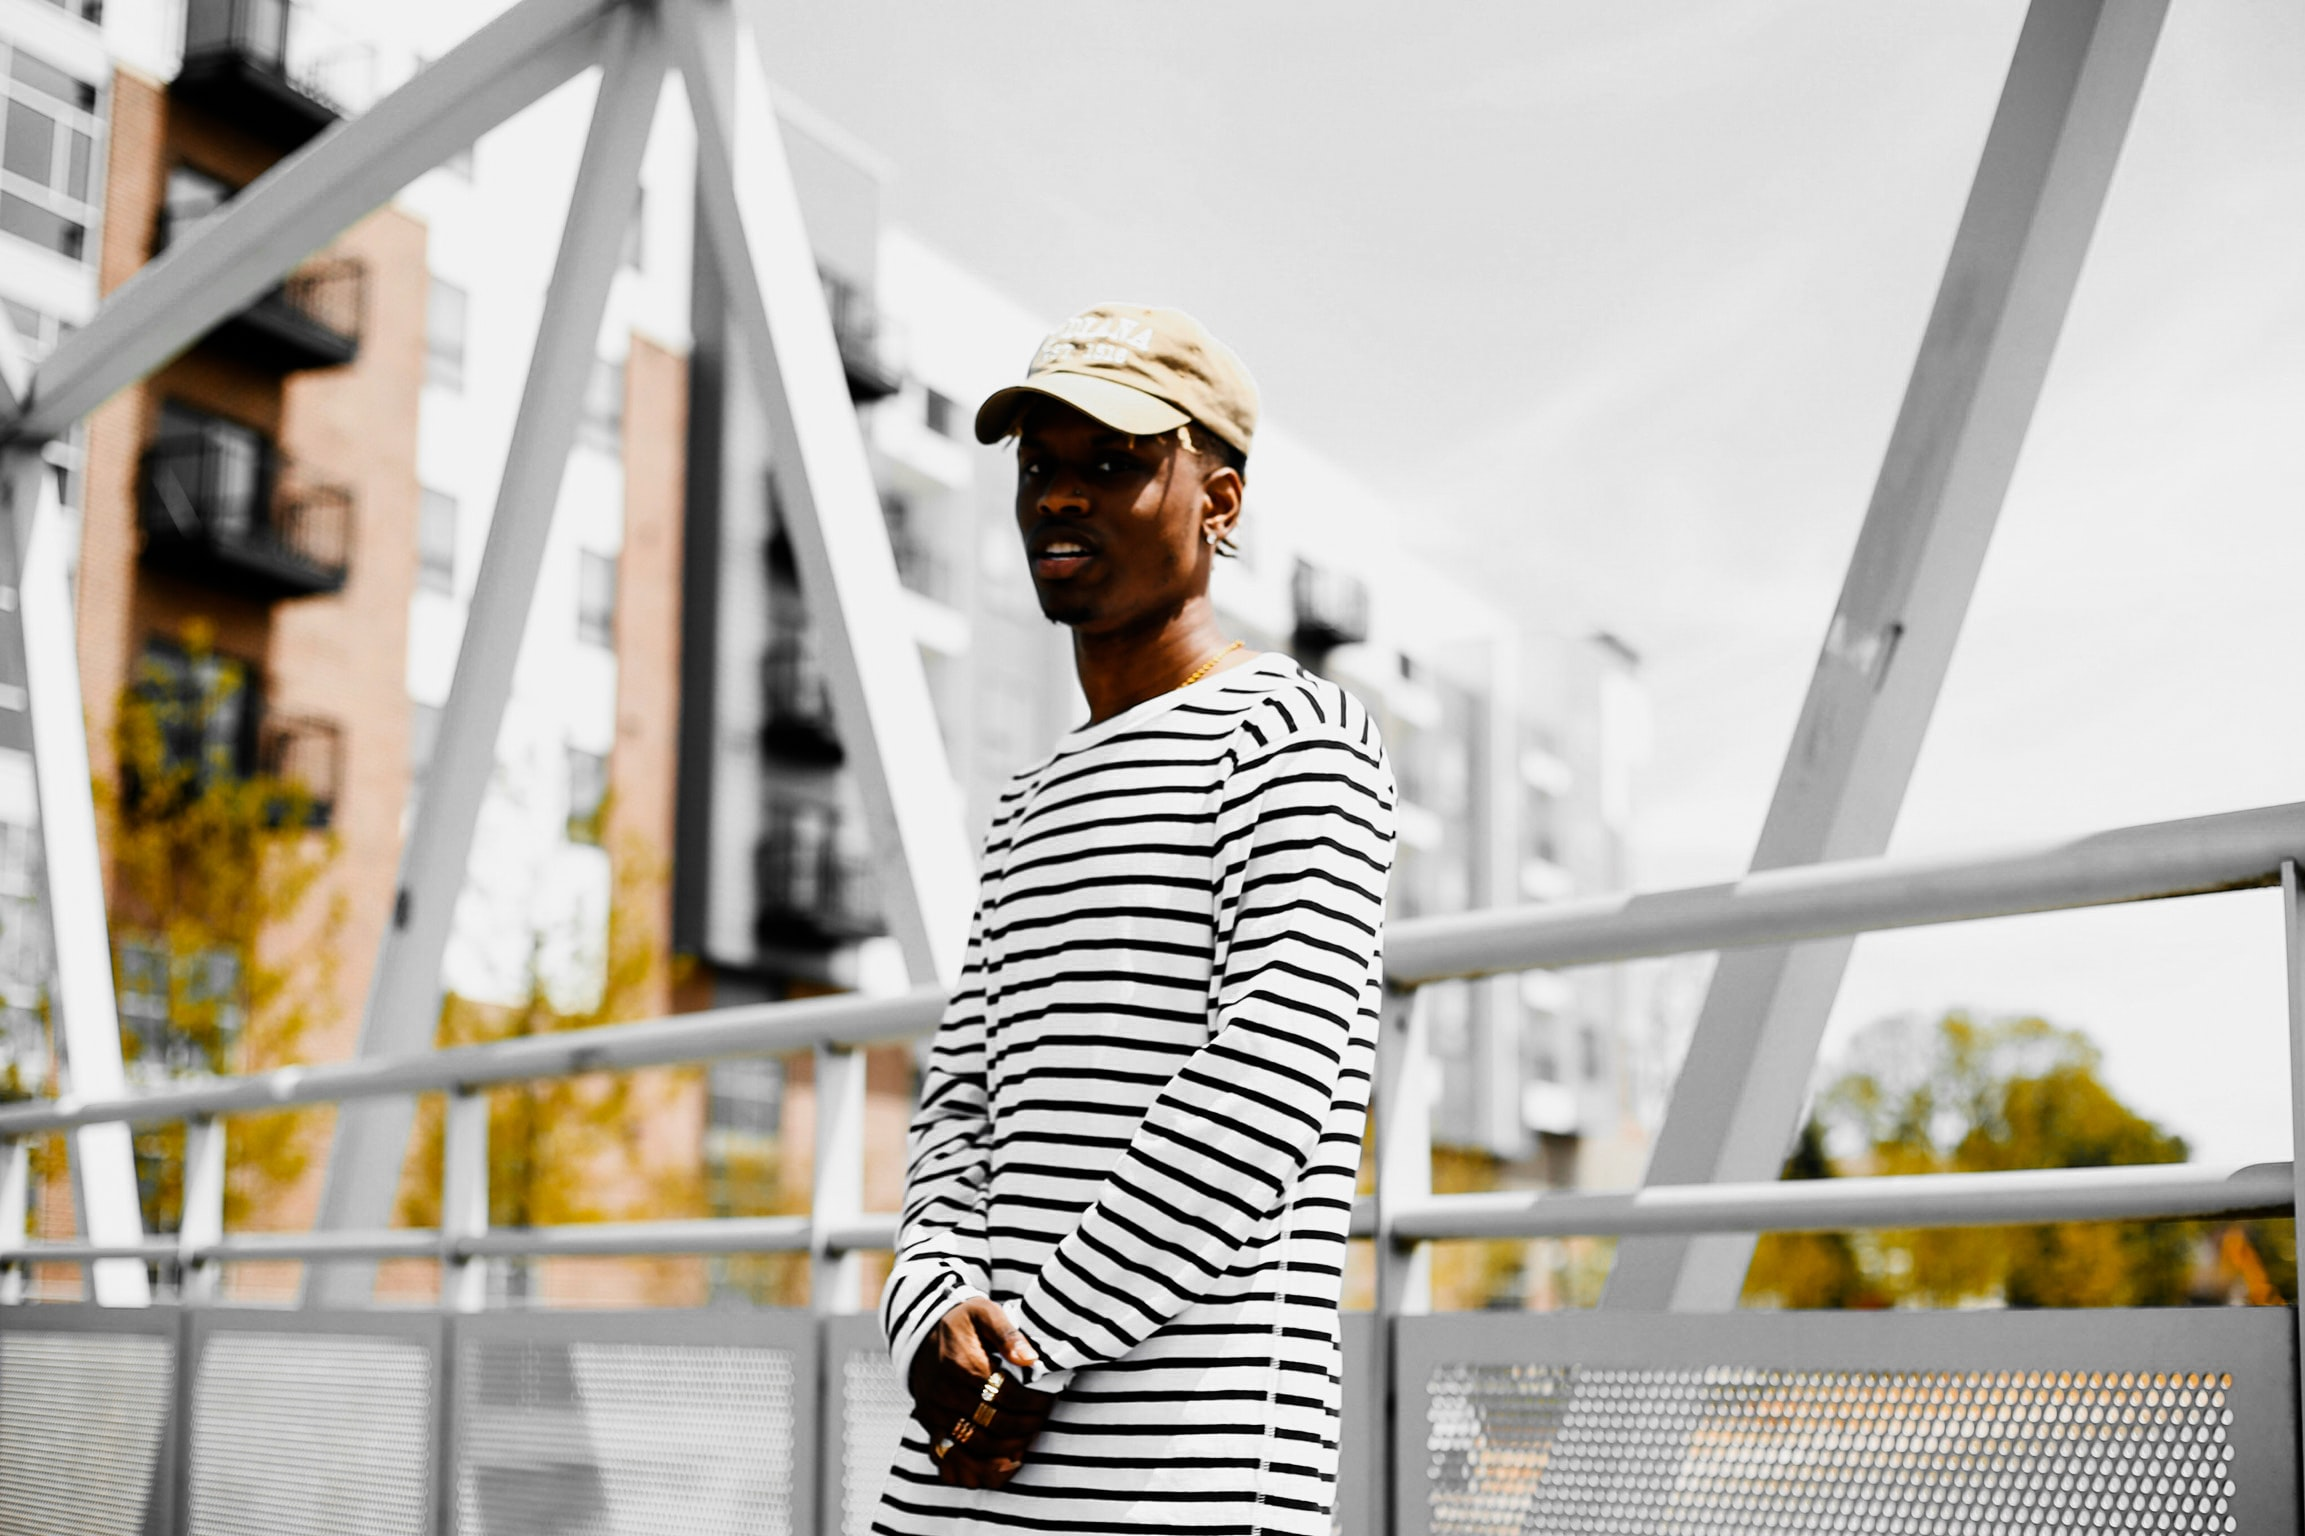 man lean on bridge rail